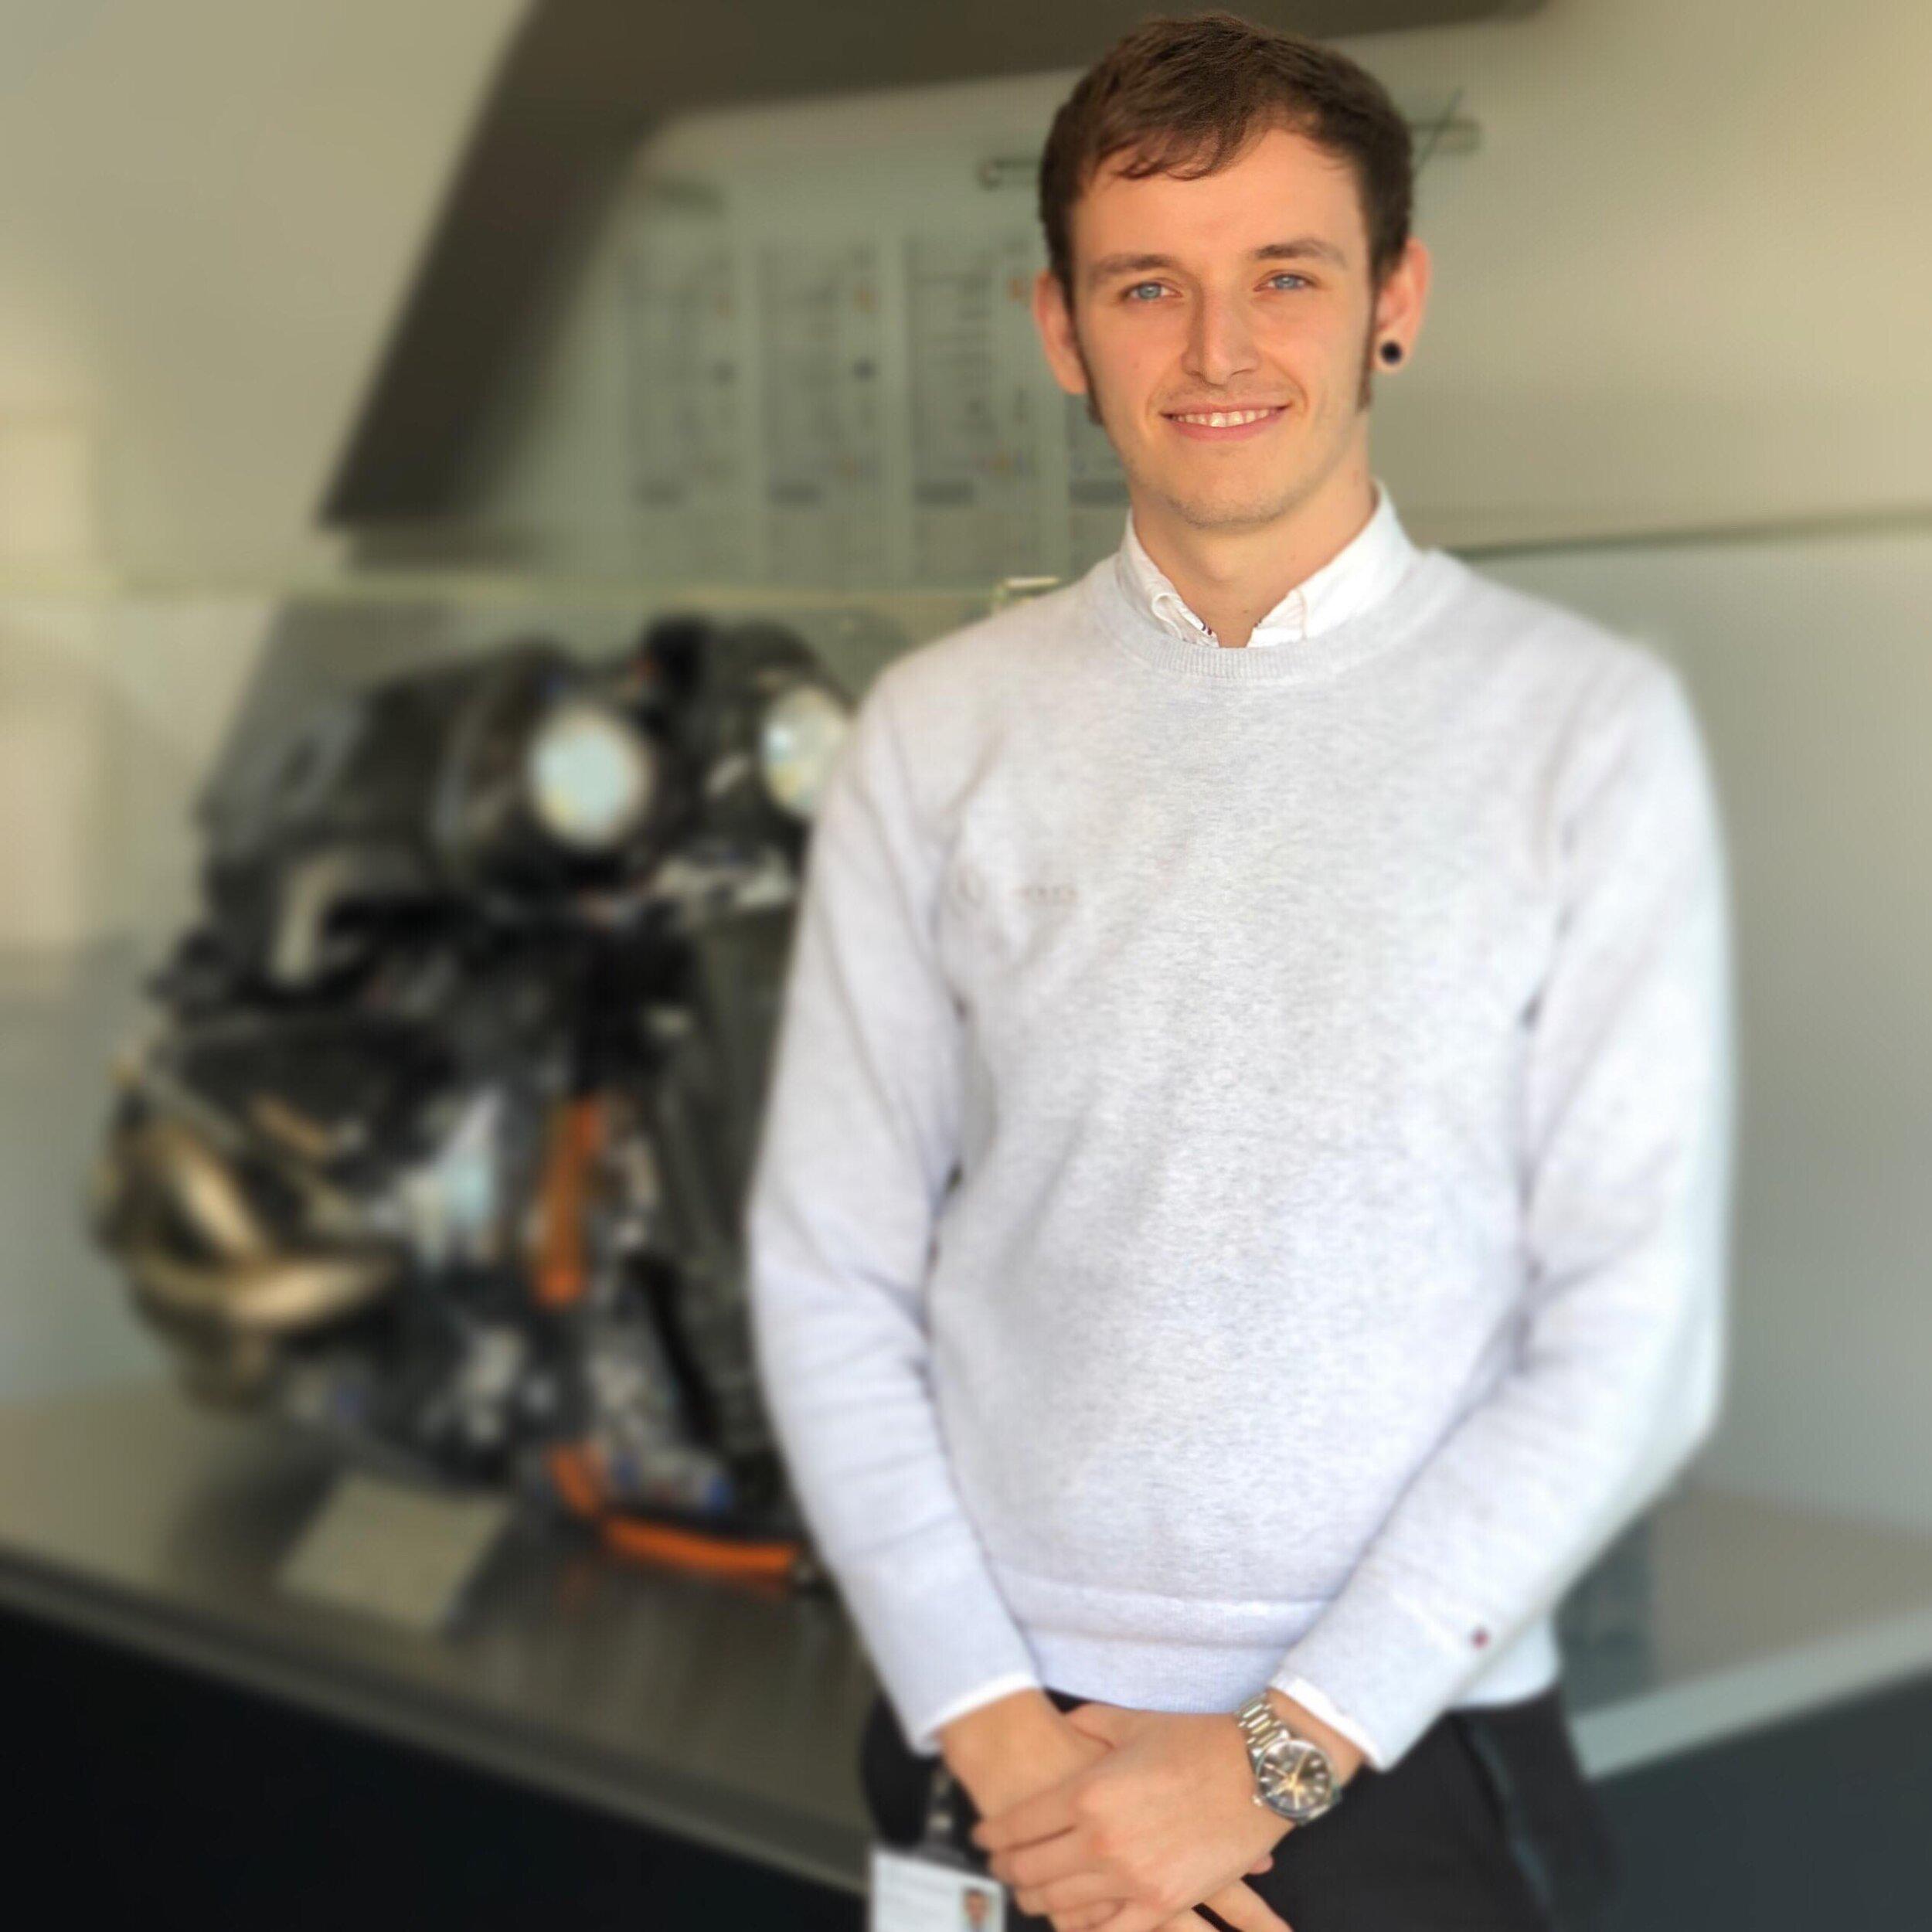 jack miszewski  year: 4  course: mechanical engineering  placement: Mercedes amg hpp